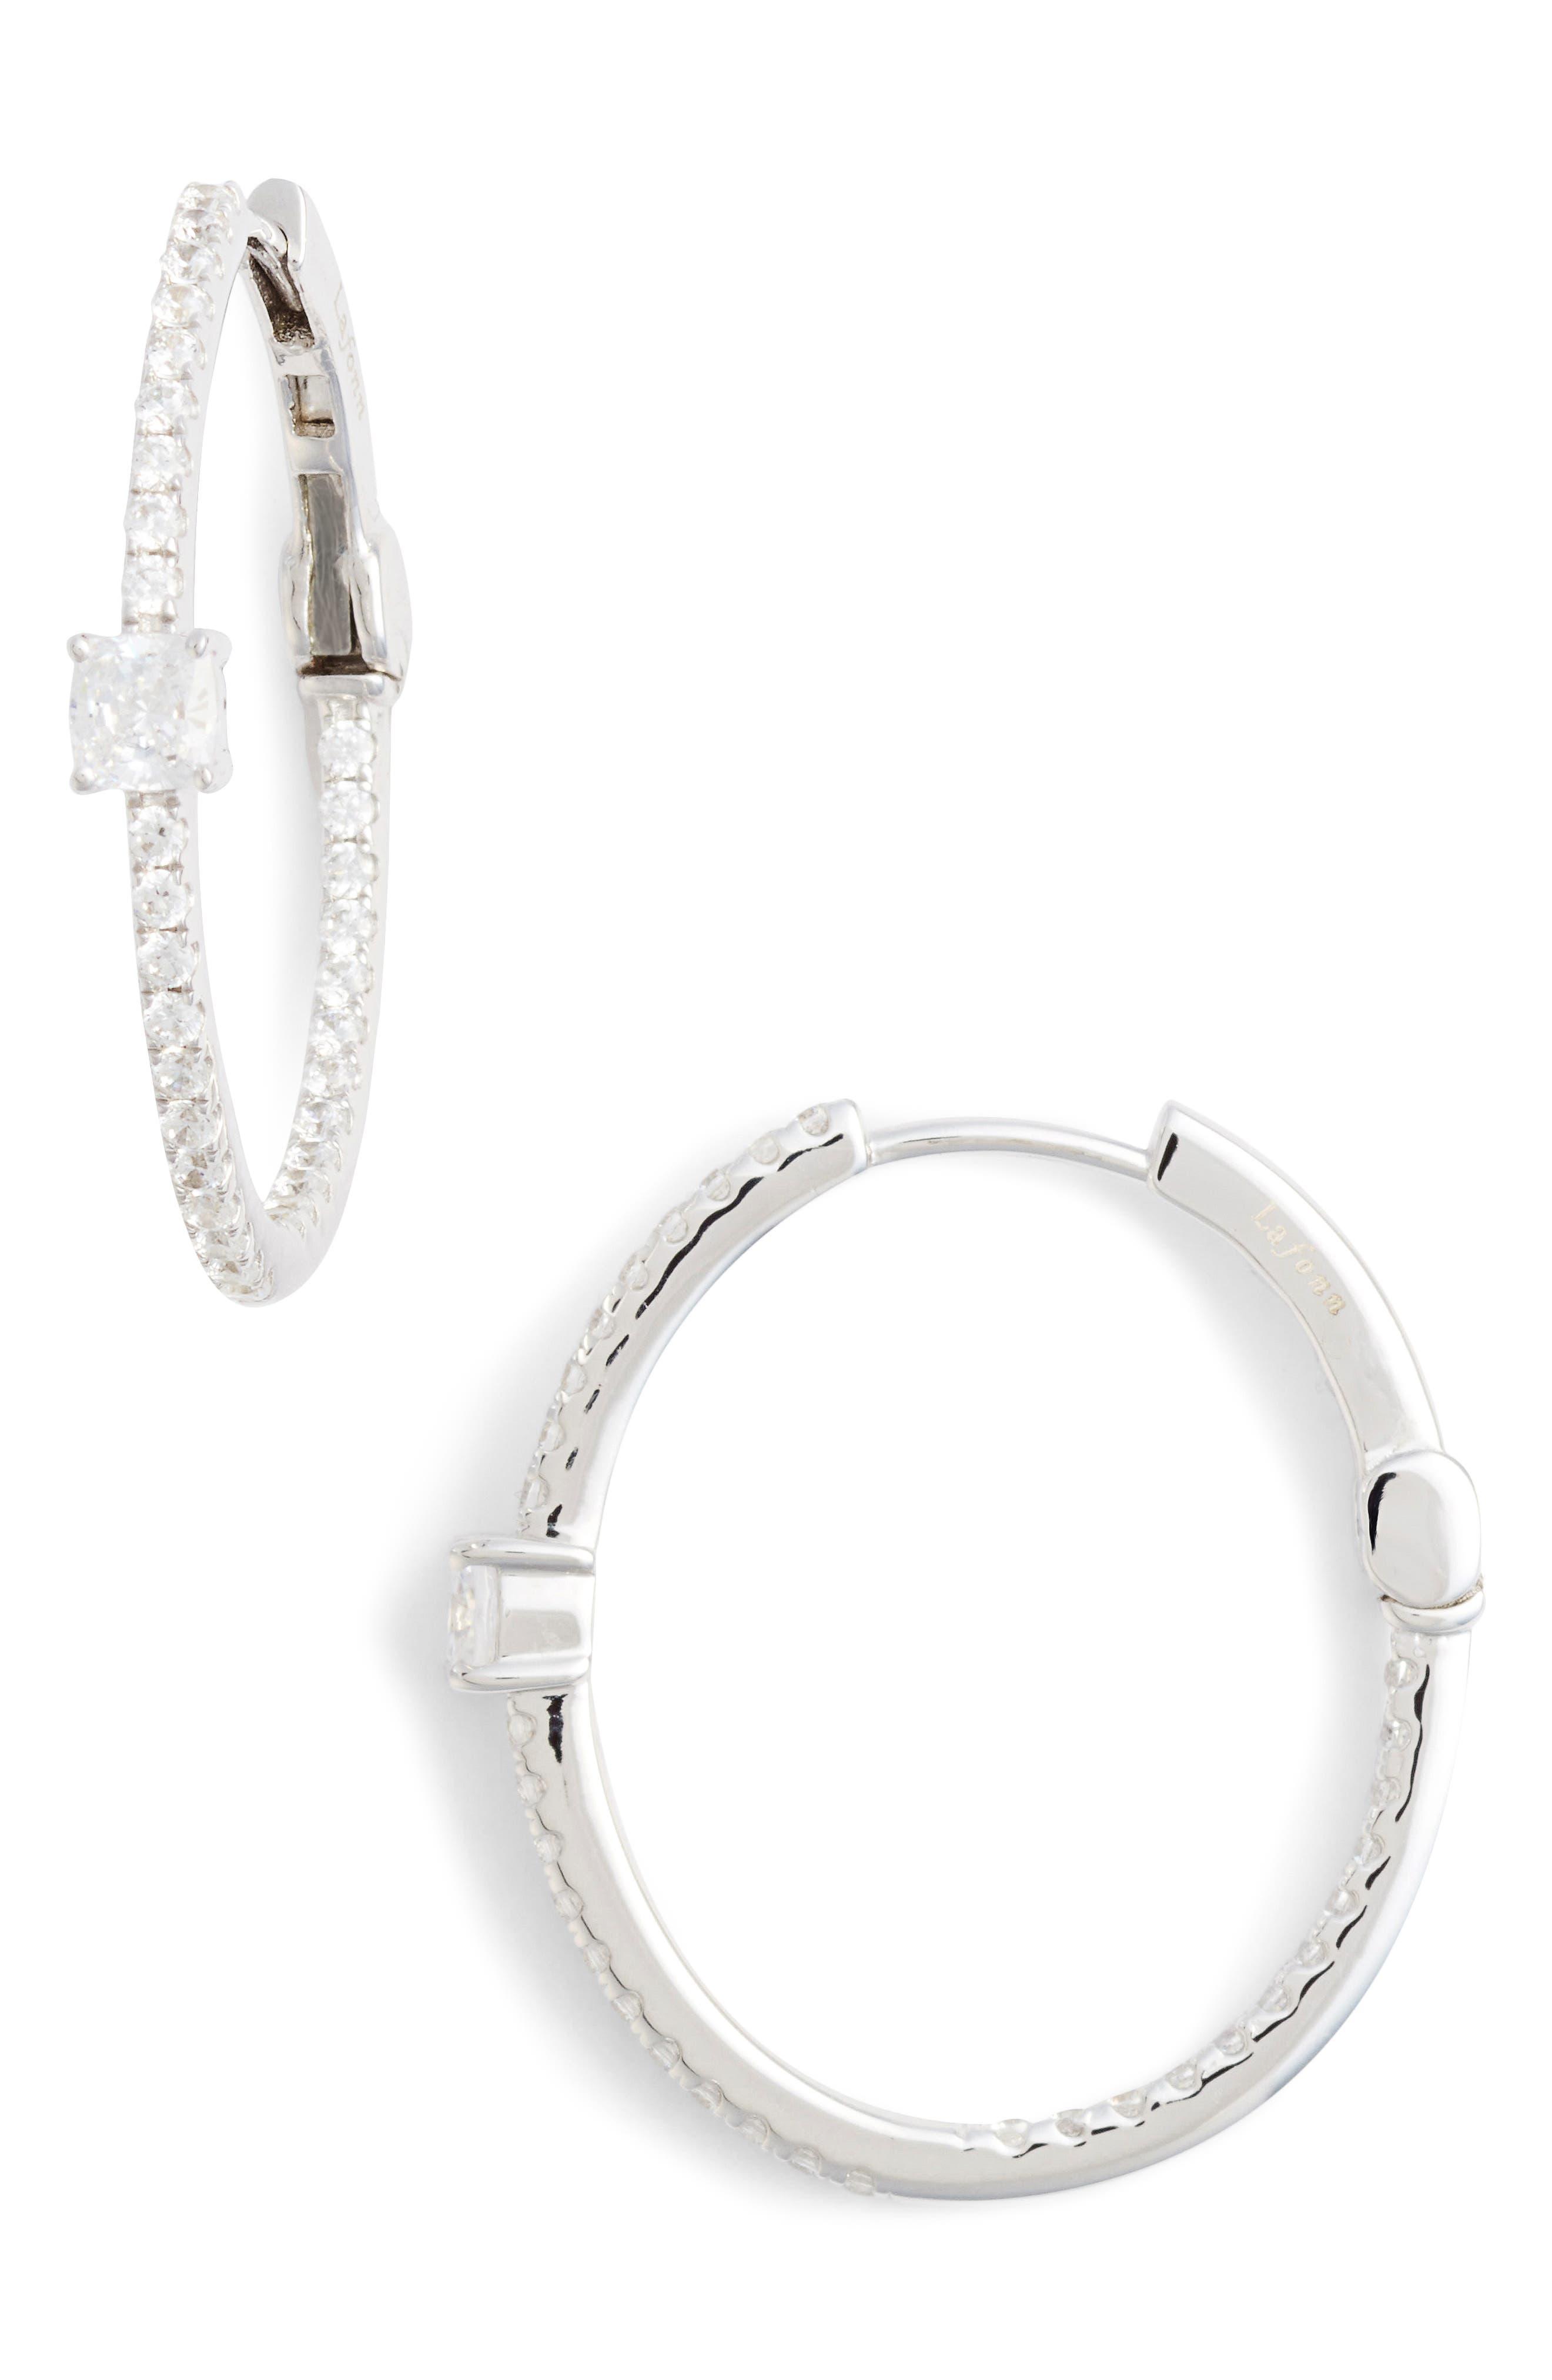 Main Image - Lafonn Simulated Diamond Hoop Earrings